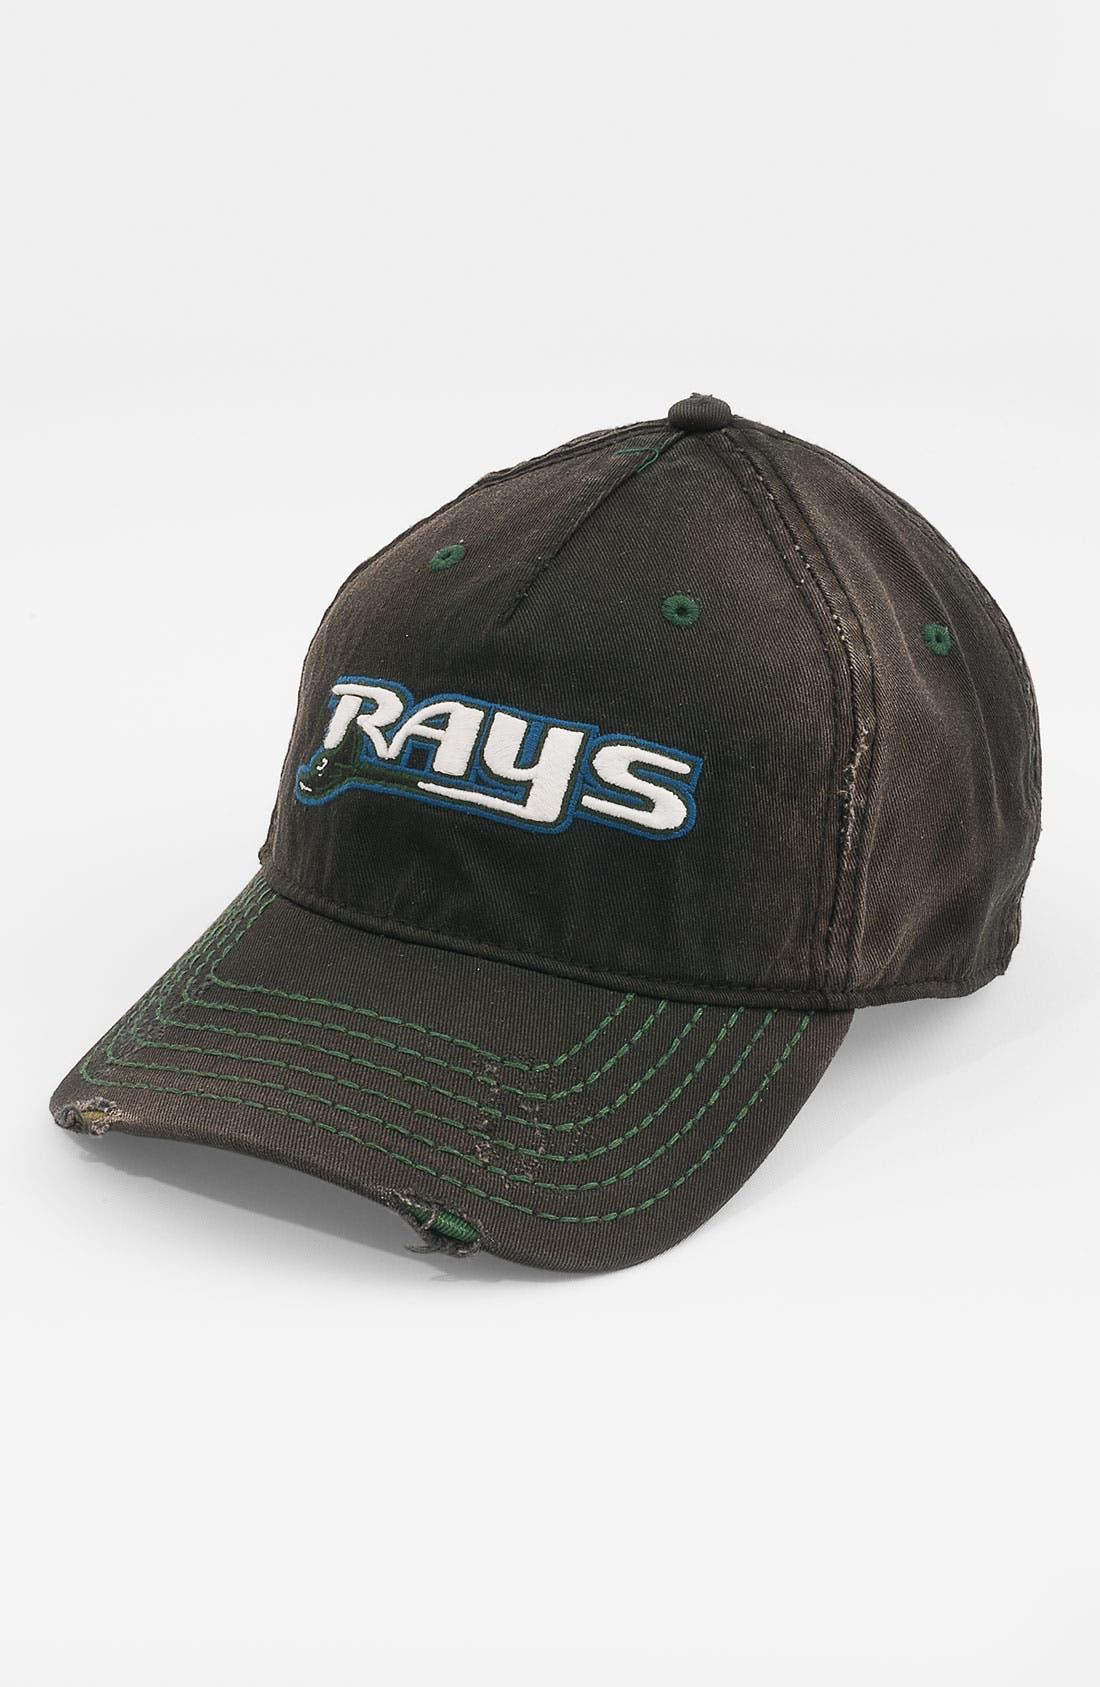 Main Image - American Needle 'Tampa Bay Rays' Baseball Cap